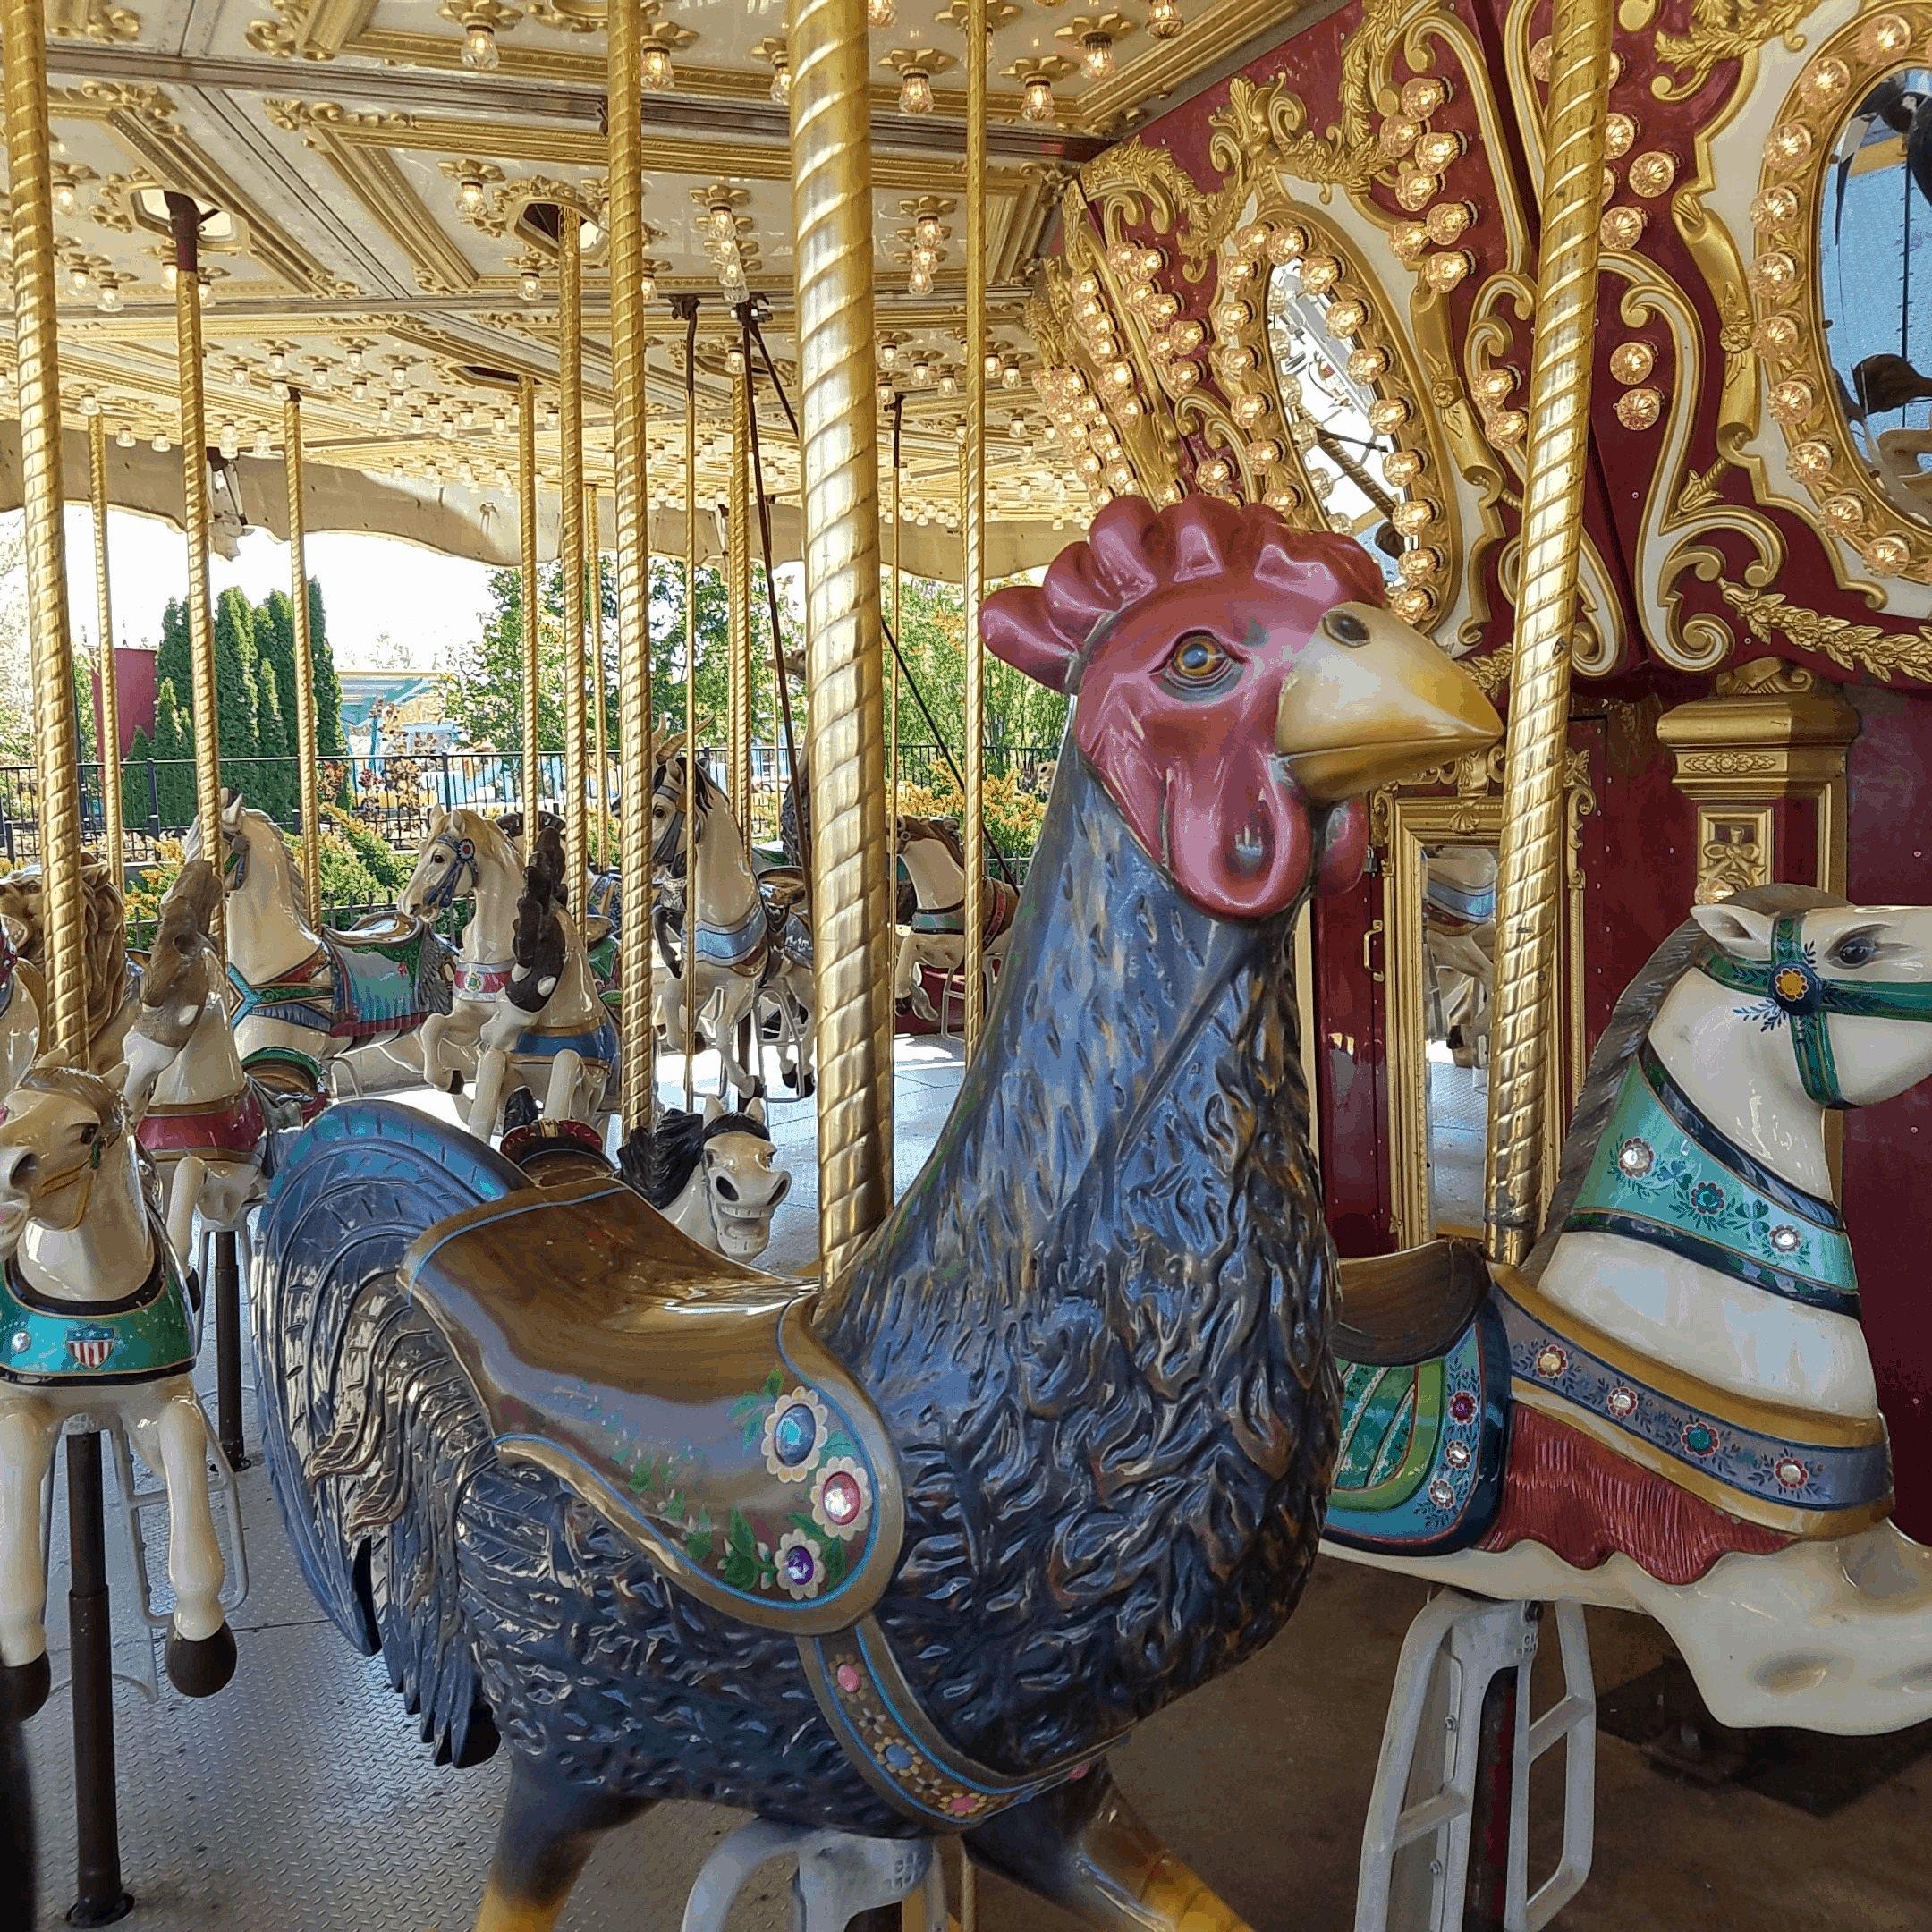 carousel at Michigan adventure